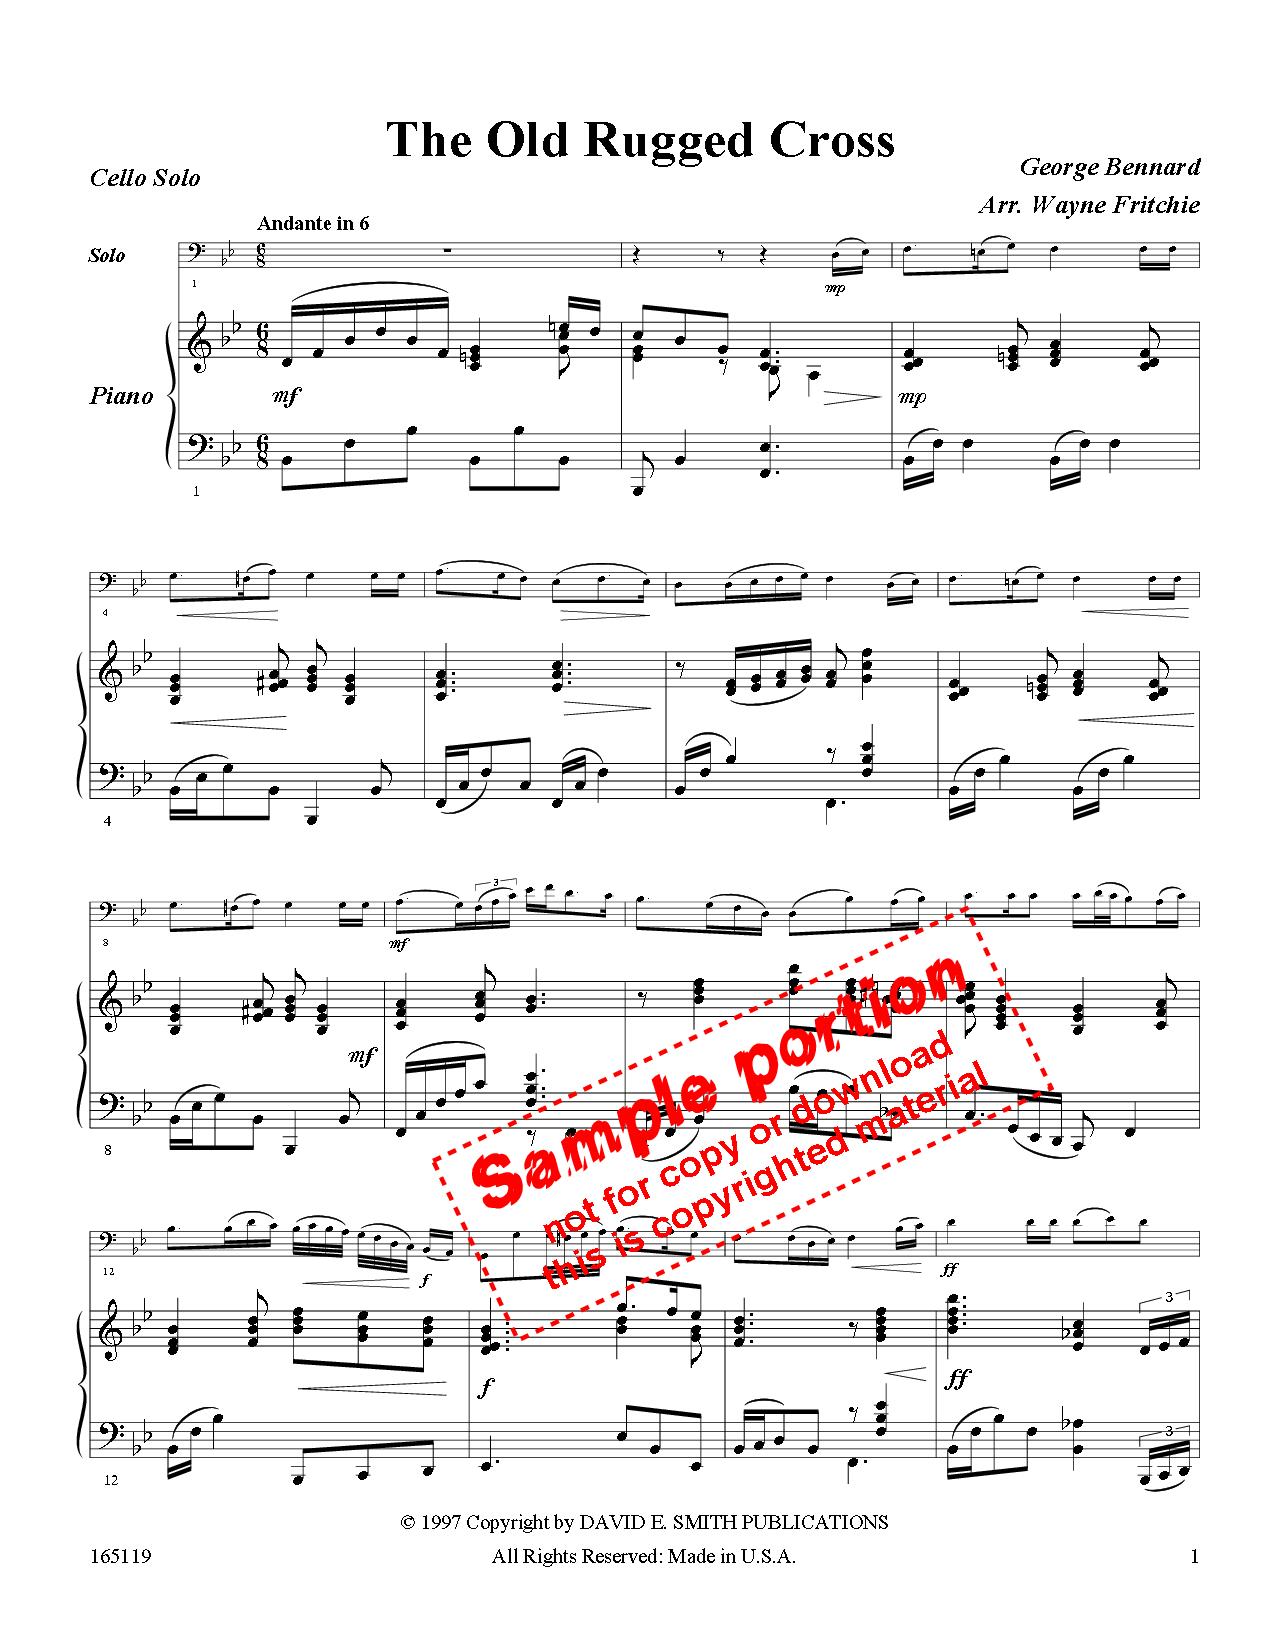 The Old Rugged Cross Sheet Music Edenaoforum